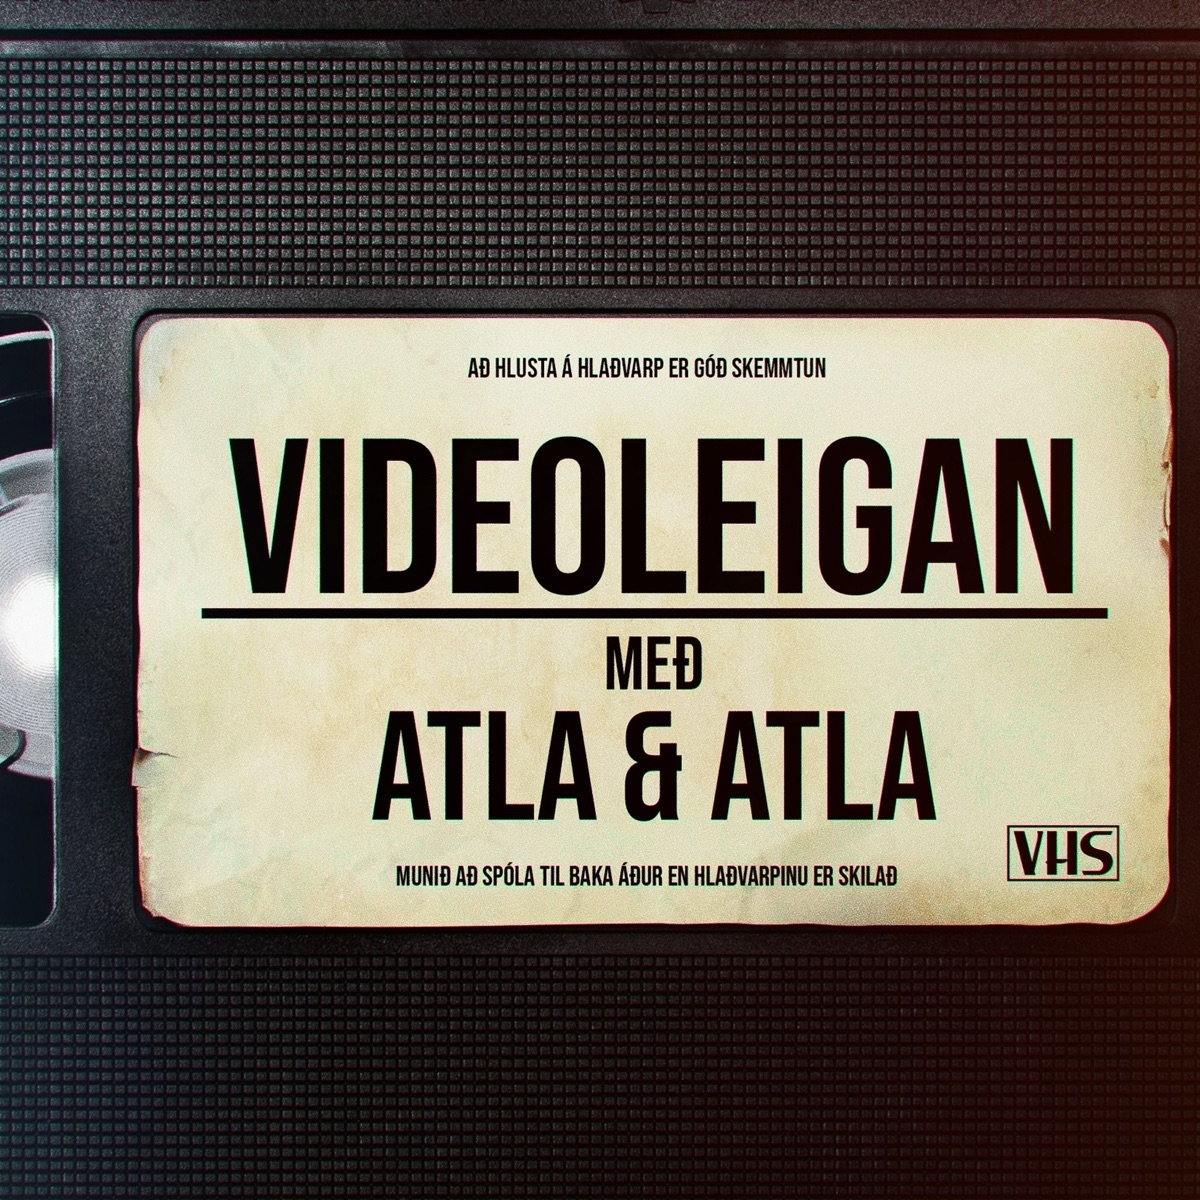 Videoleigan